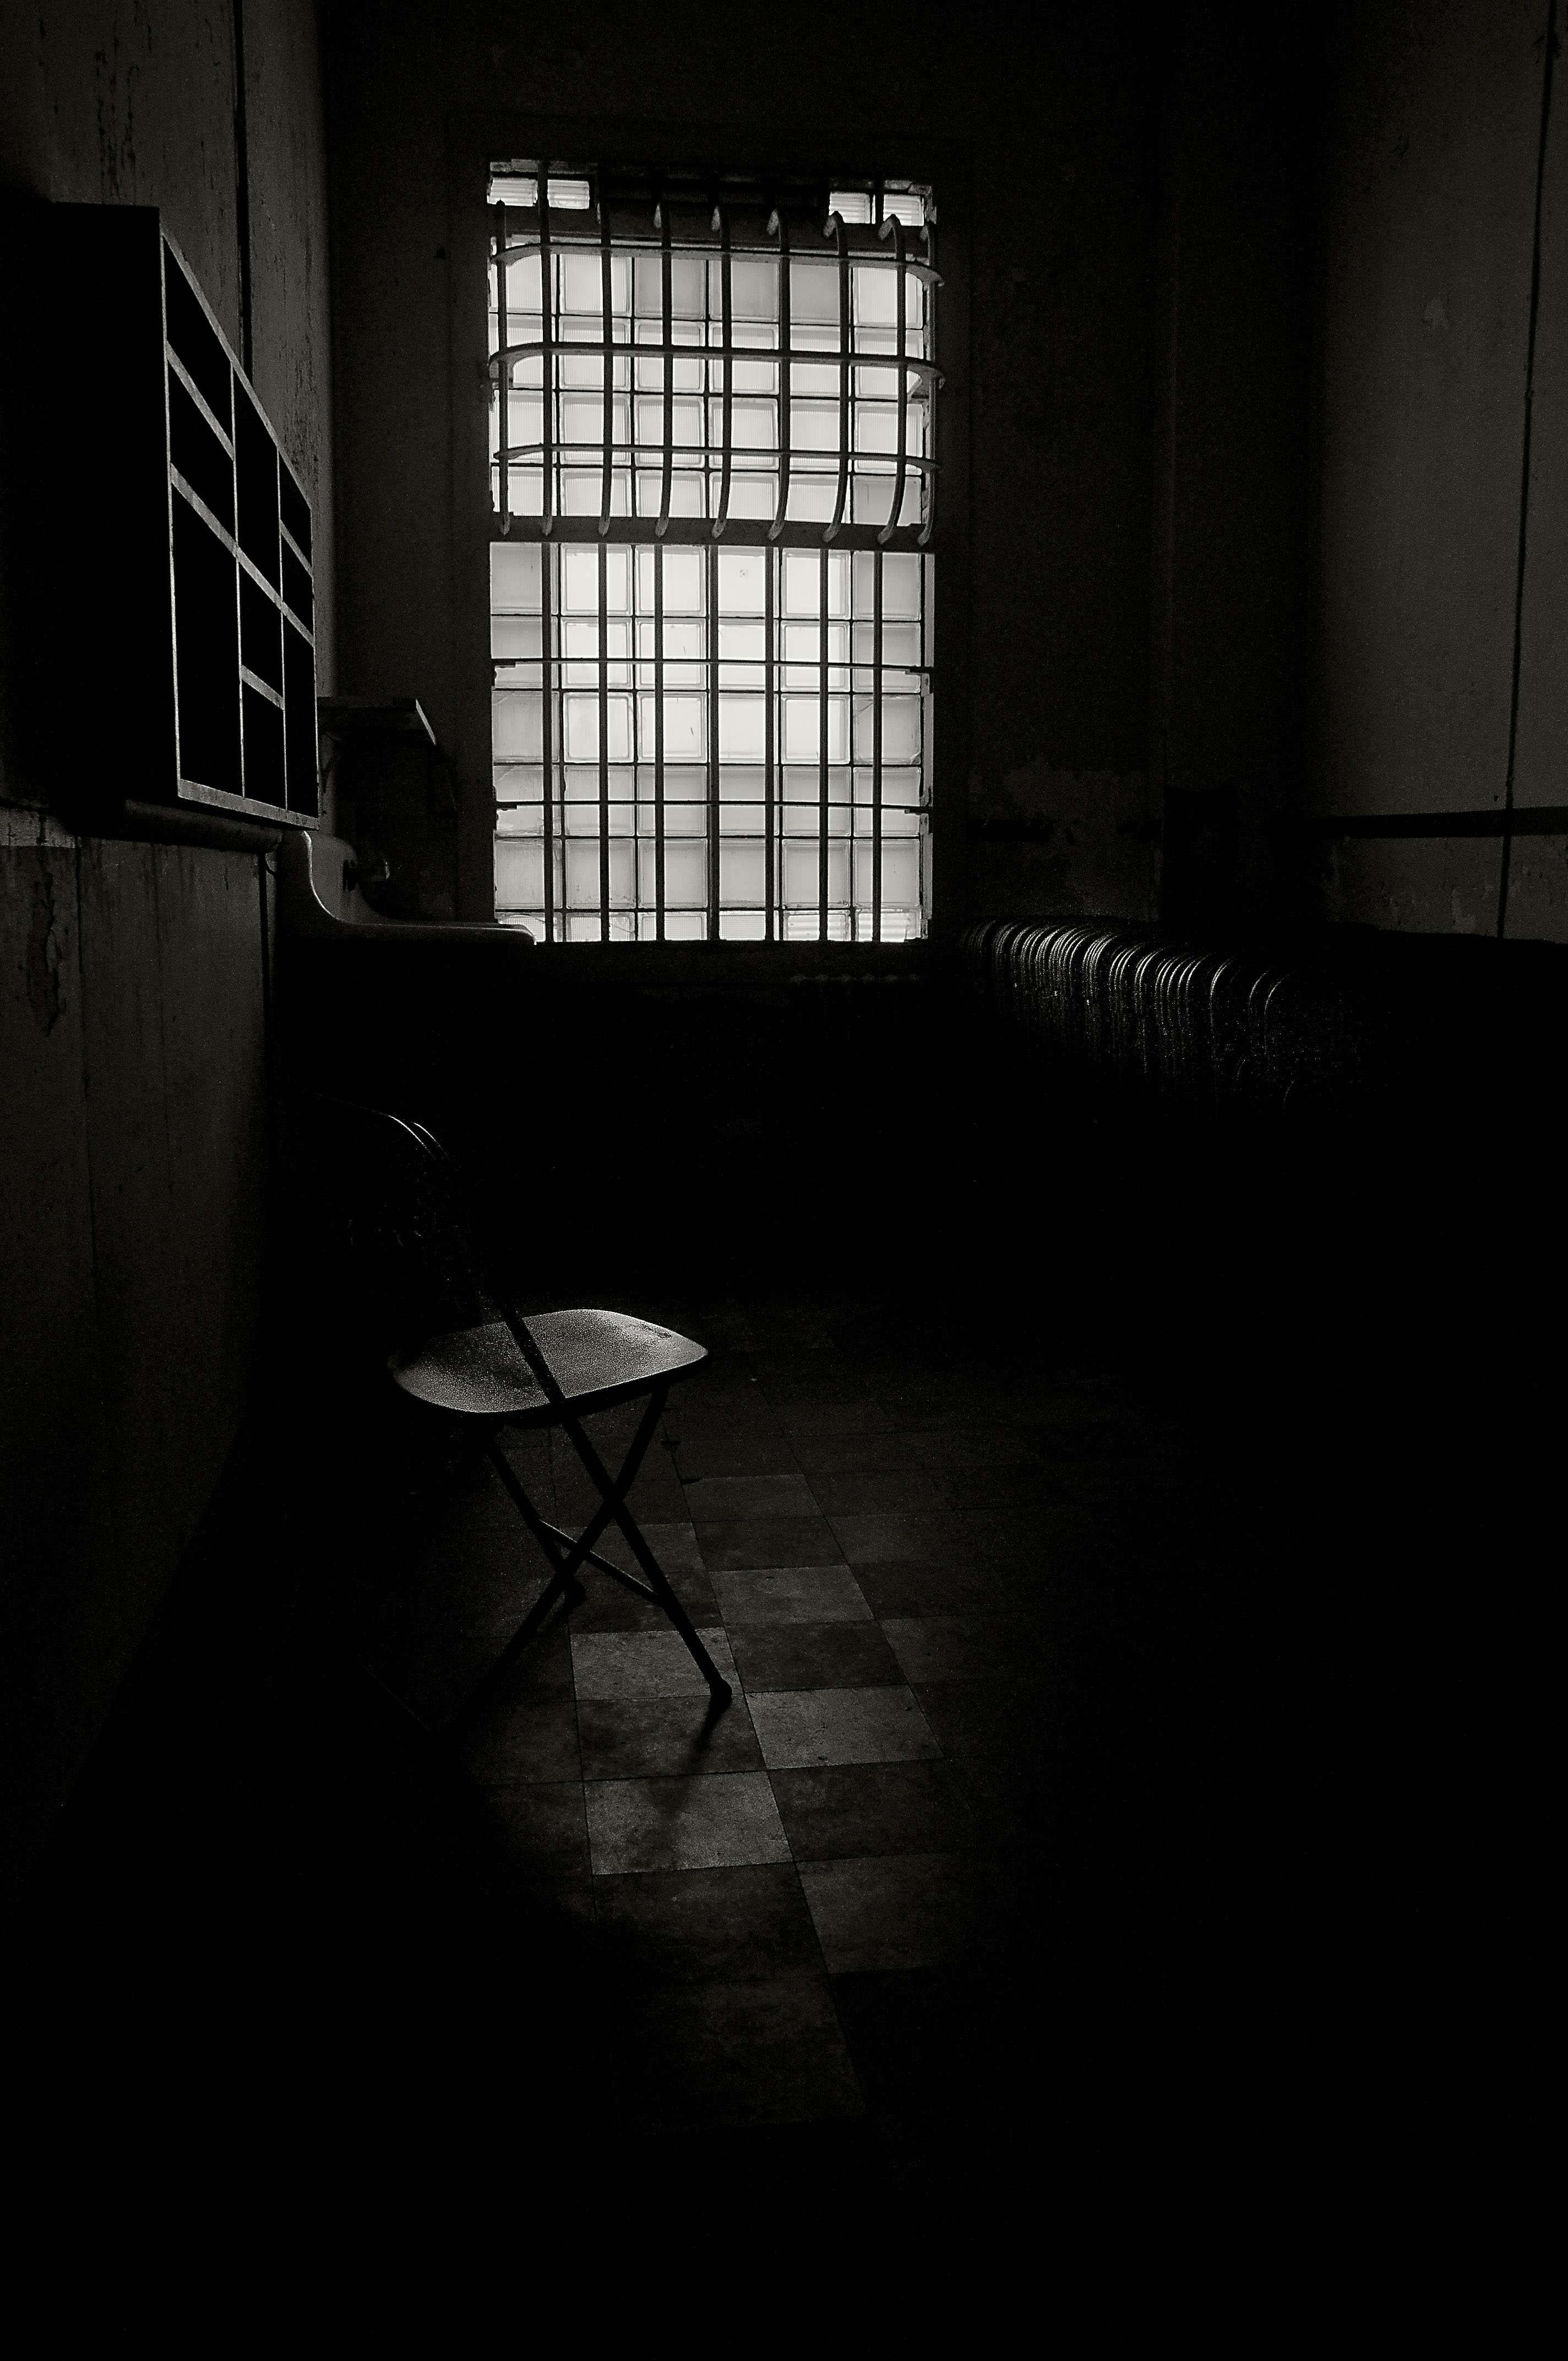 Dark Room - Home Design Ideas - adidascc-sonic.us